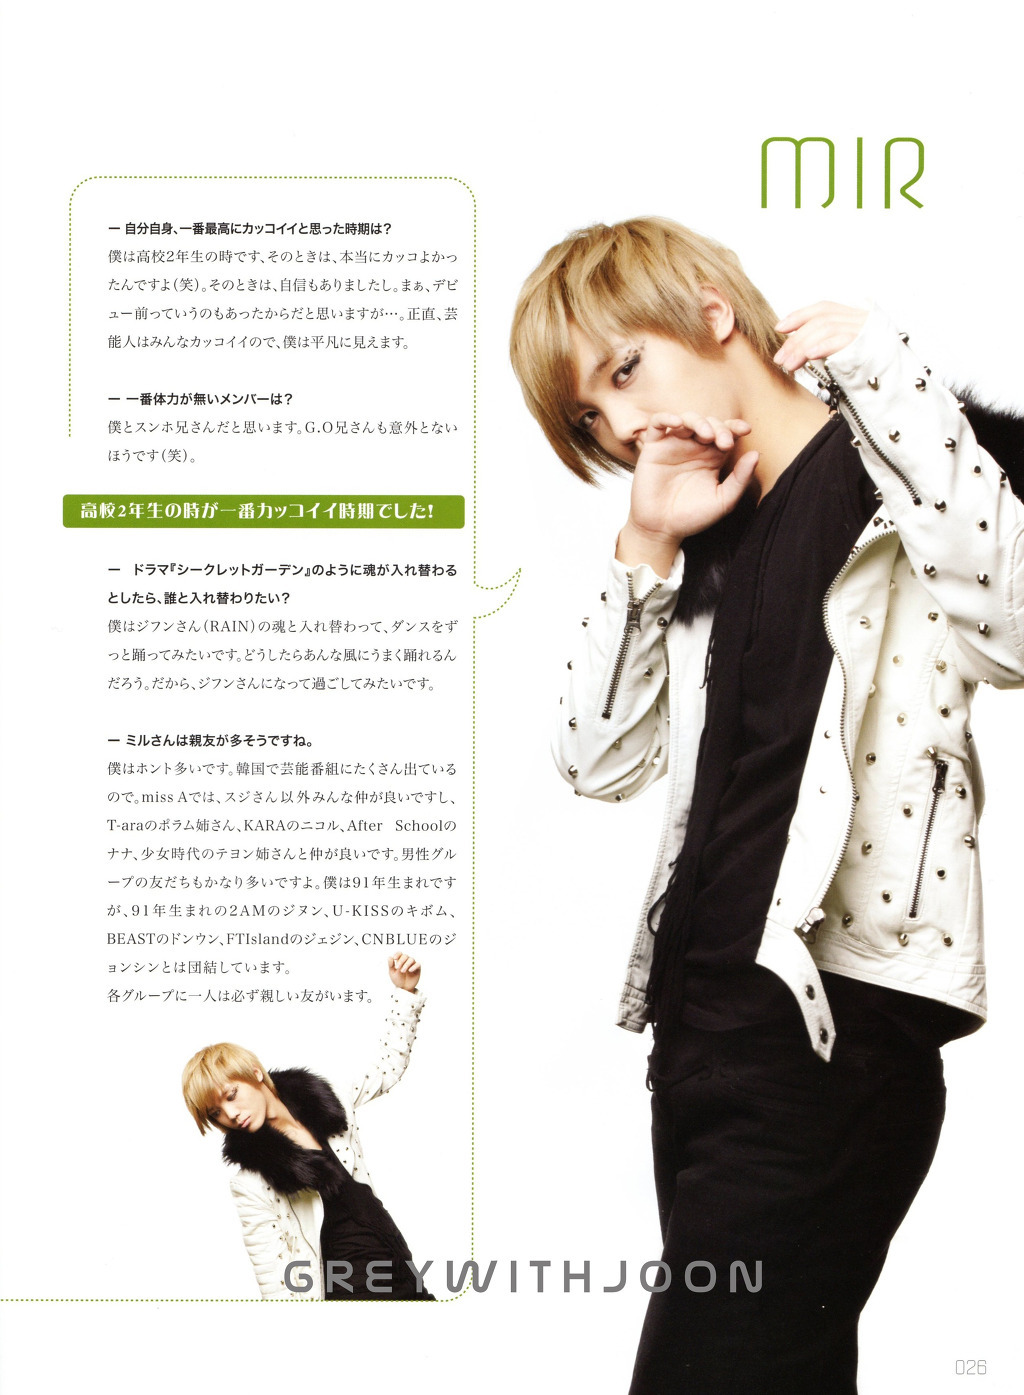 [01.03.11]MBLAQ @ CREA STAR Scan5